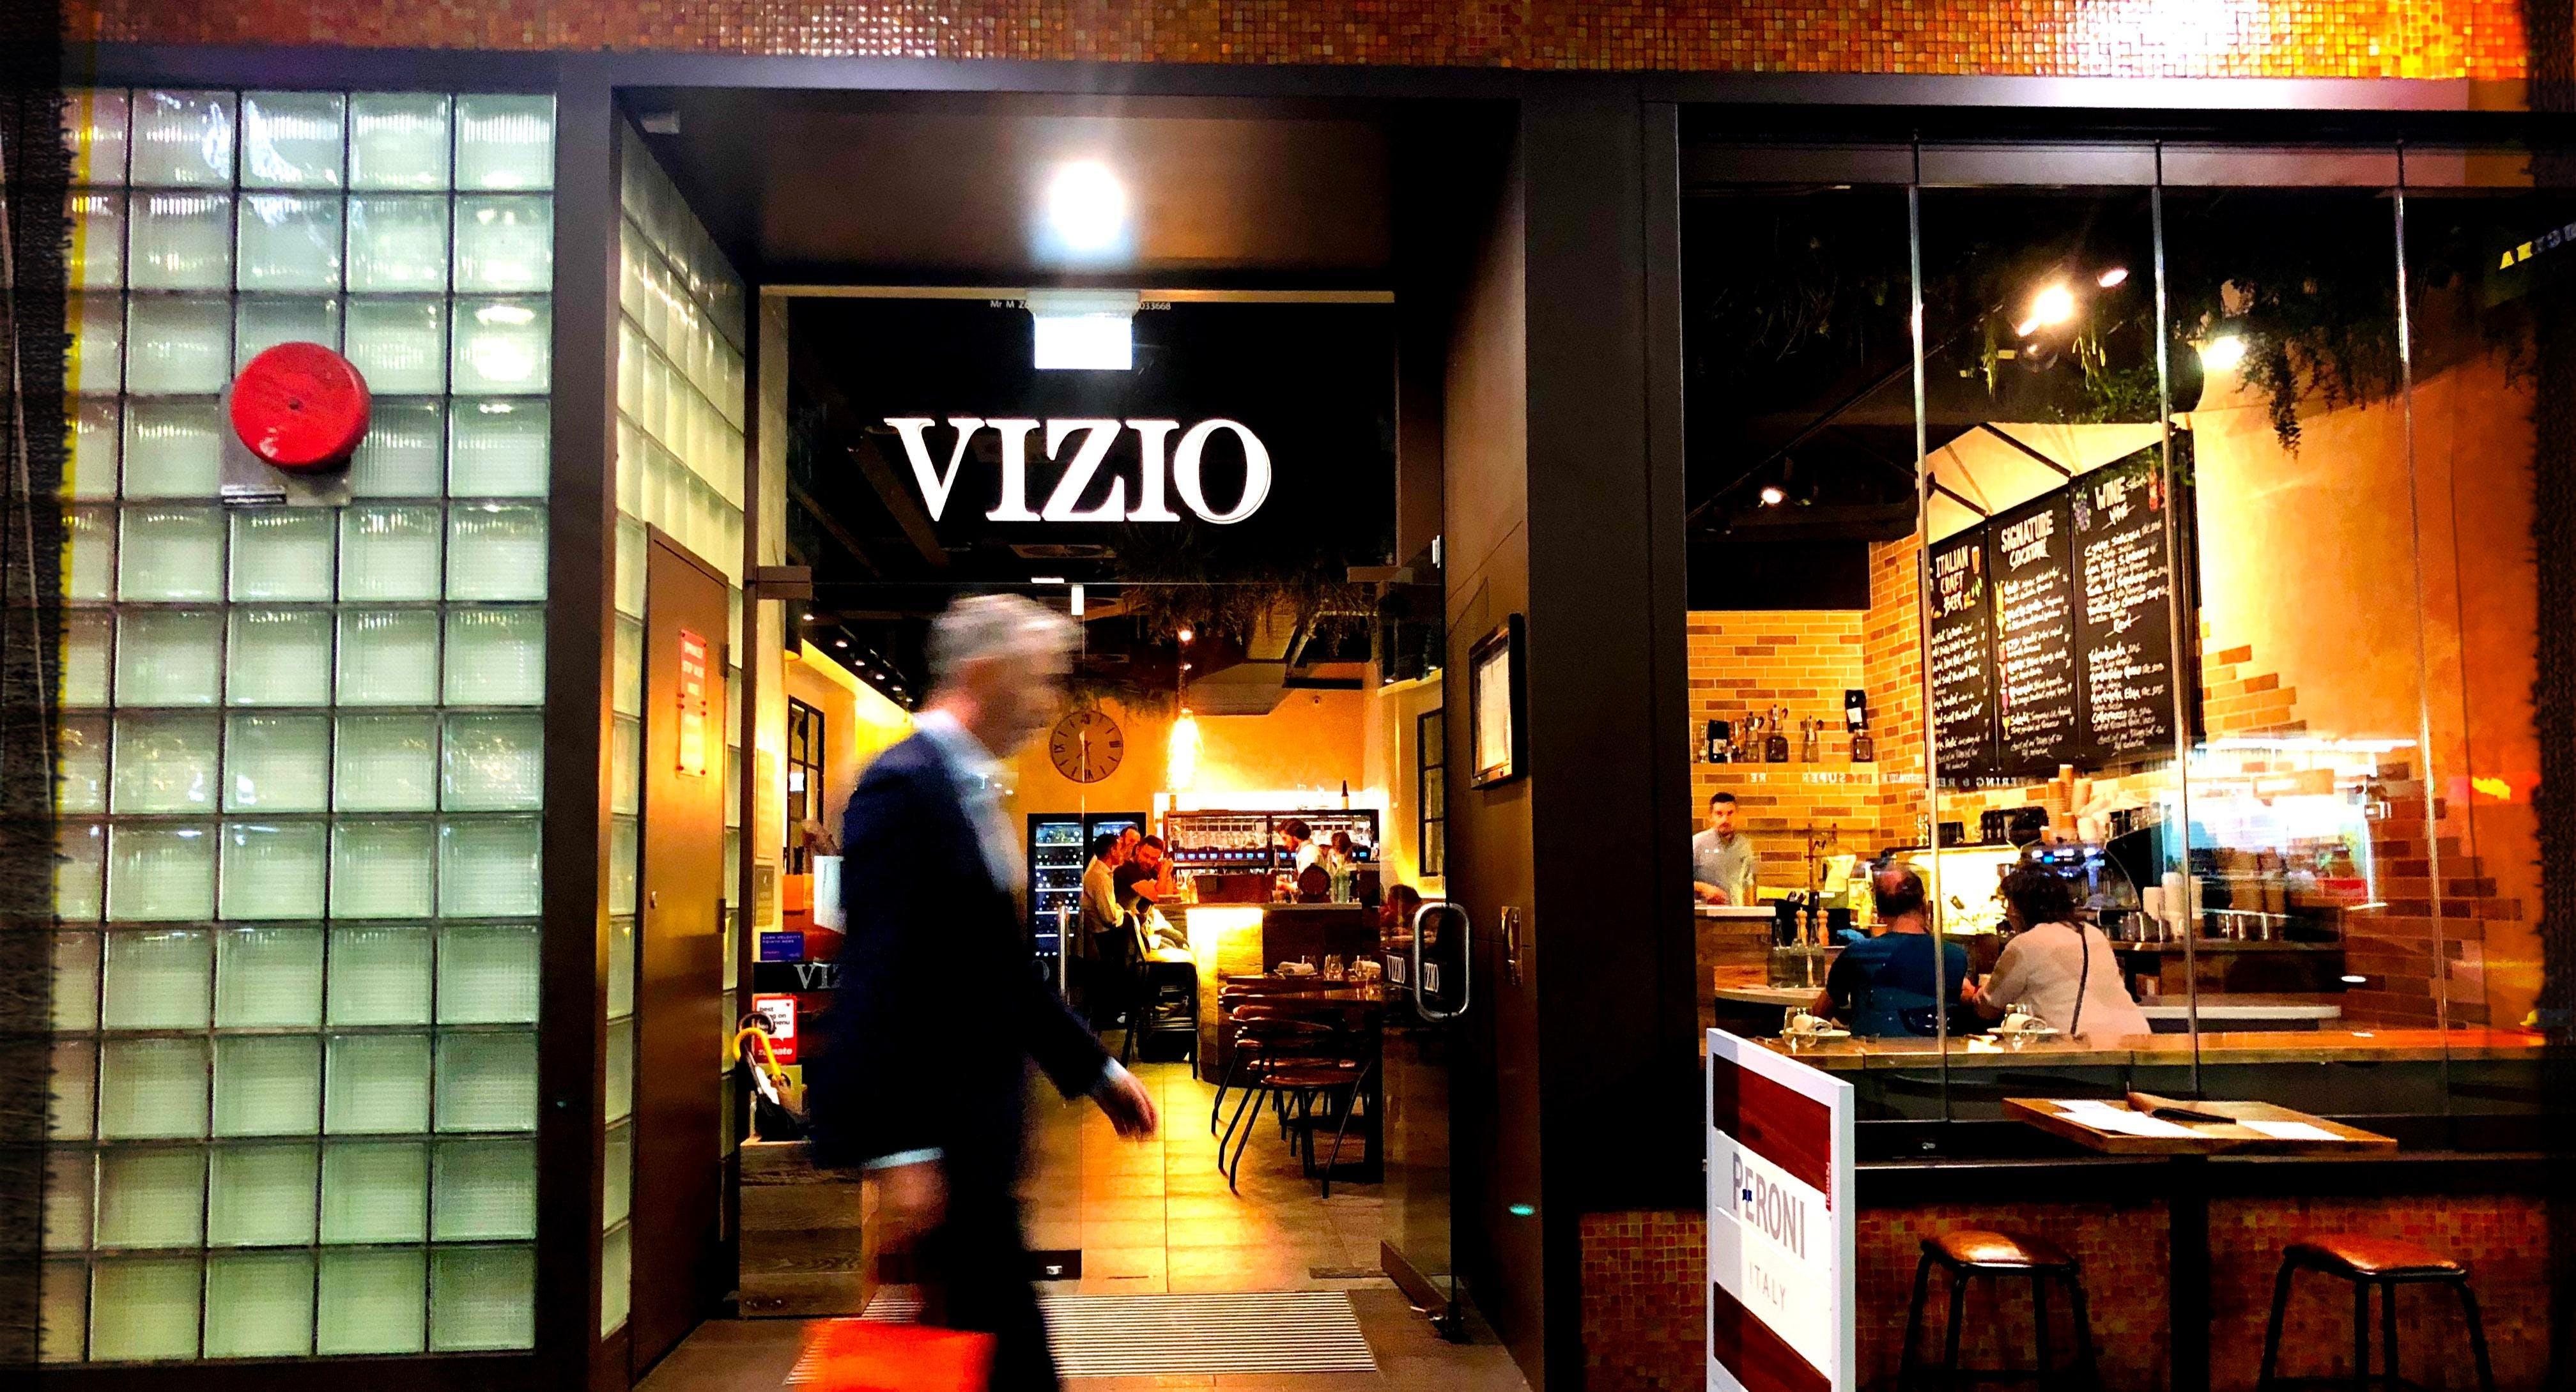 Vizio Caffe e Cucina Sydney image 2